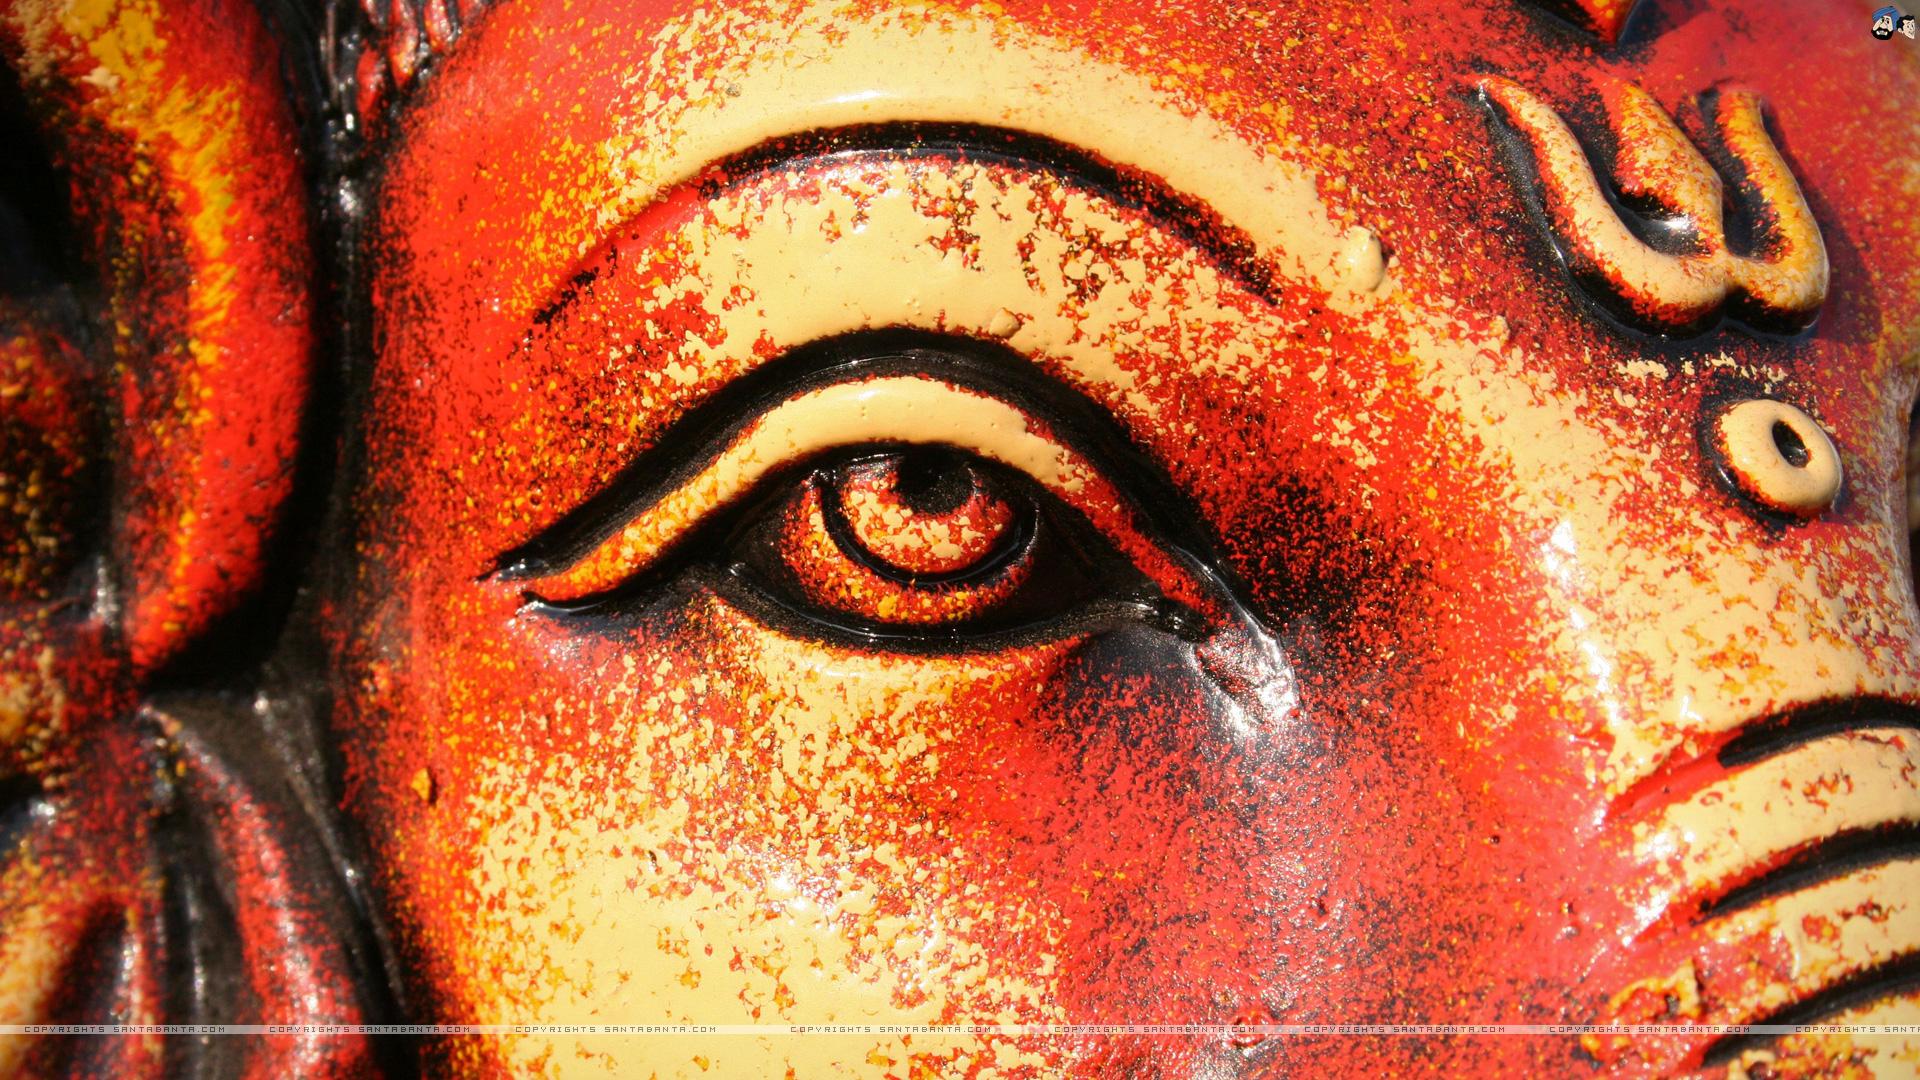 Ganpati Wallpaper Hd Full Size For Pc Lord Ganesha Tandav Hd O